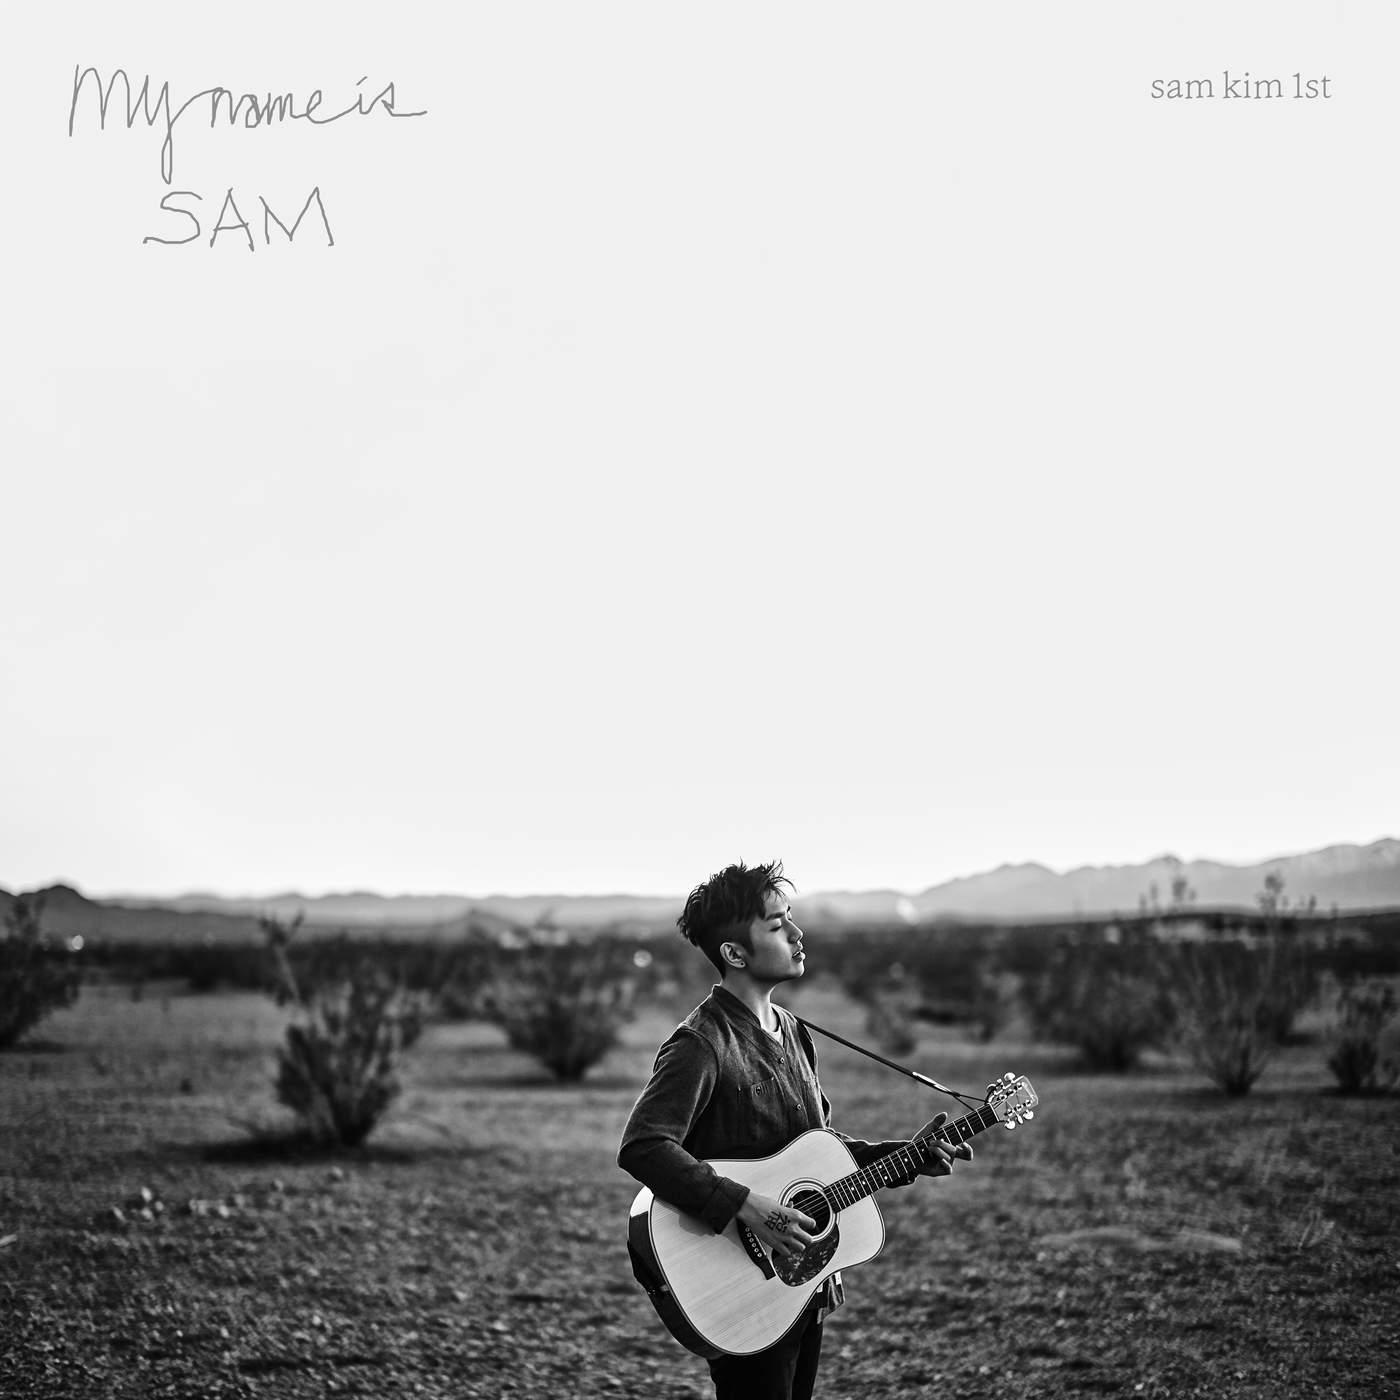 SAM KIM – My Name Is Sam – Single (ITUNES PLUS AAC M4A)